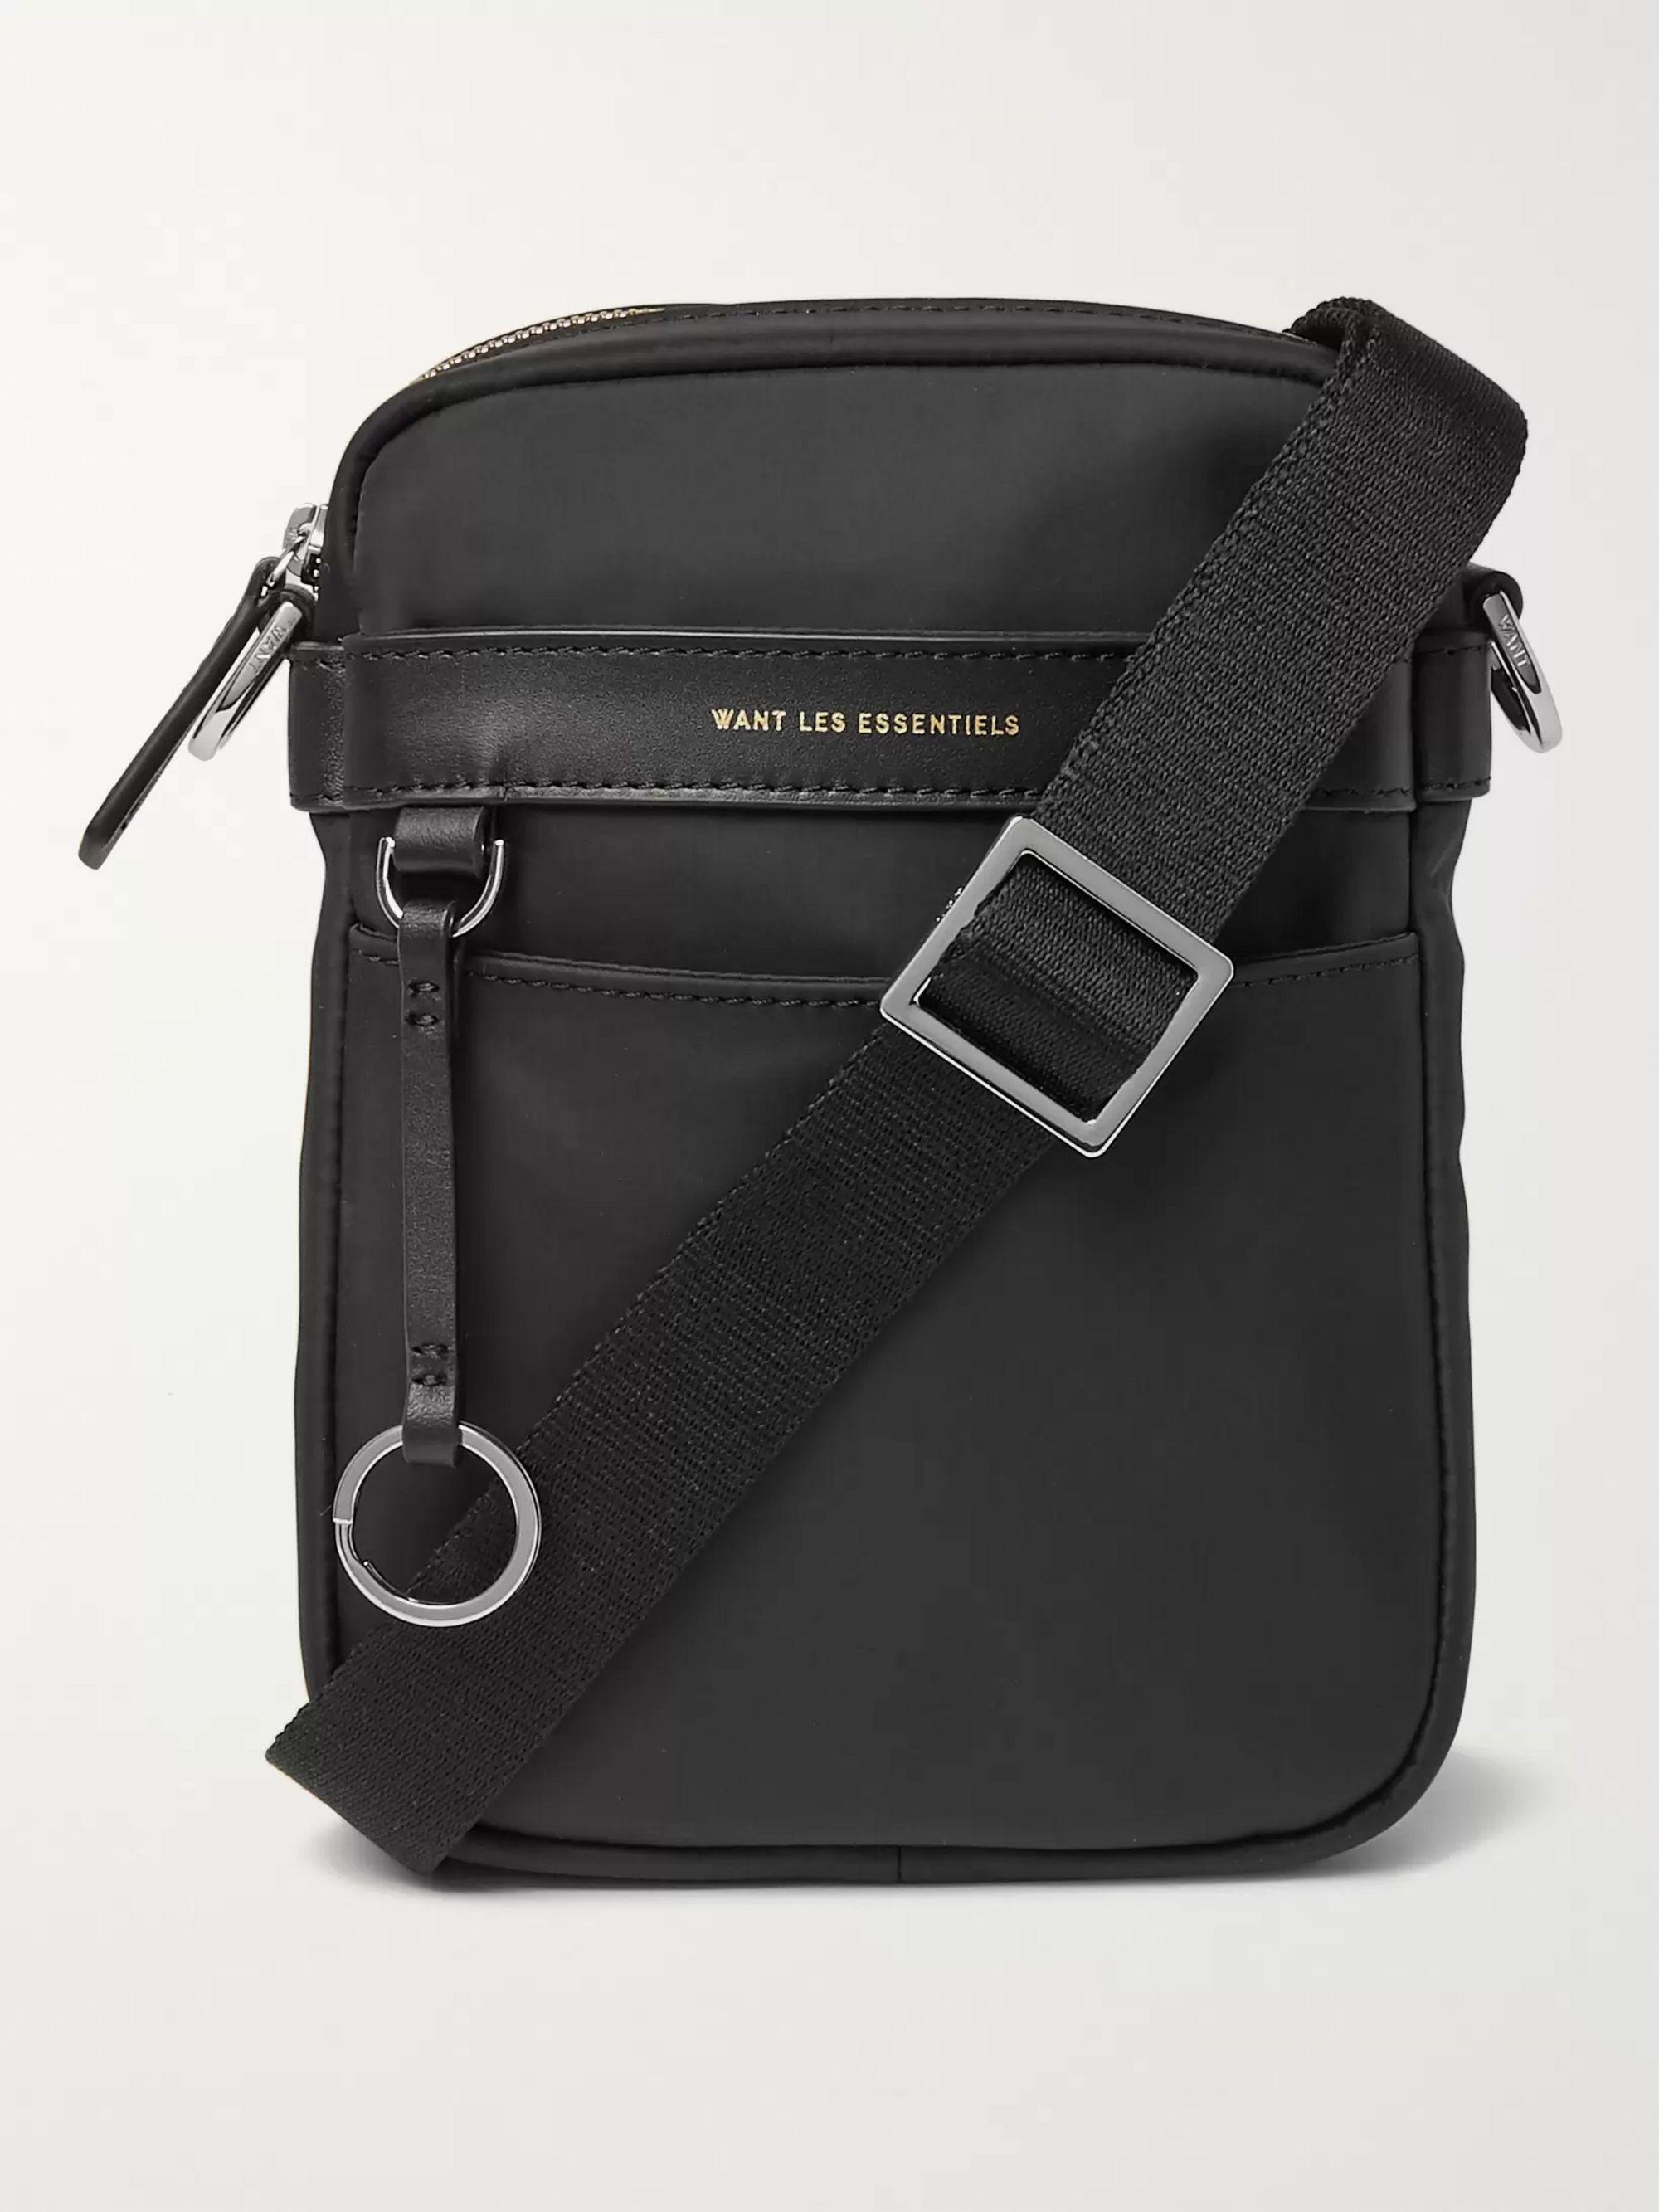 WANT LES ESSENTIELS Reagan Leather-Trimmed Nylon Messenger Bag,Black